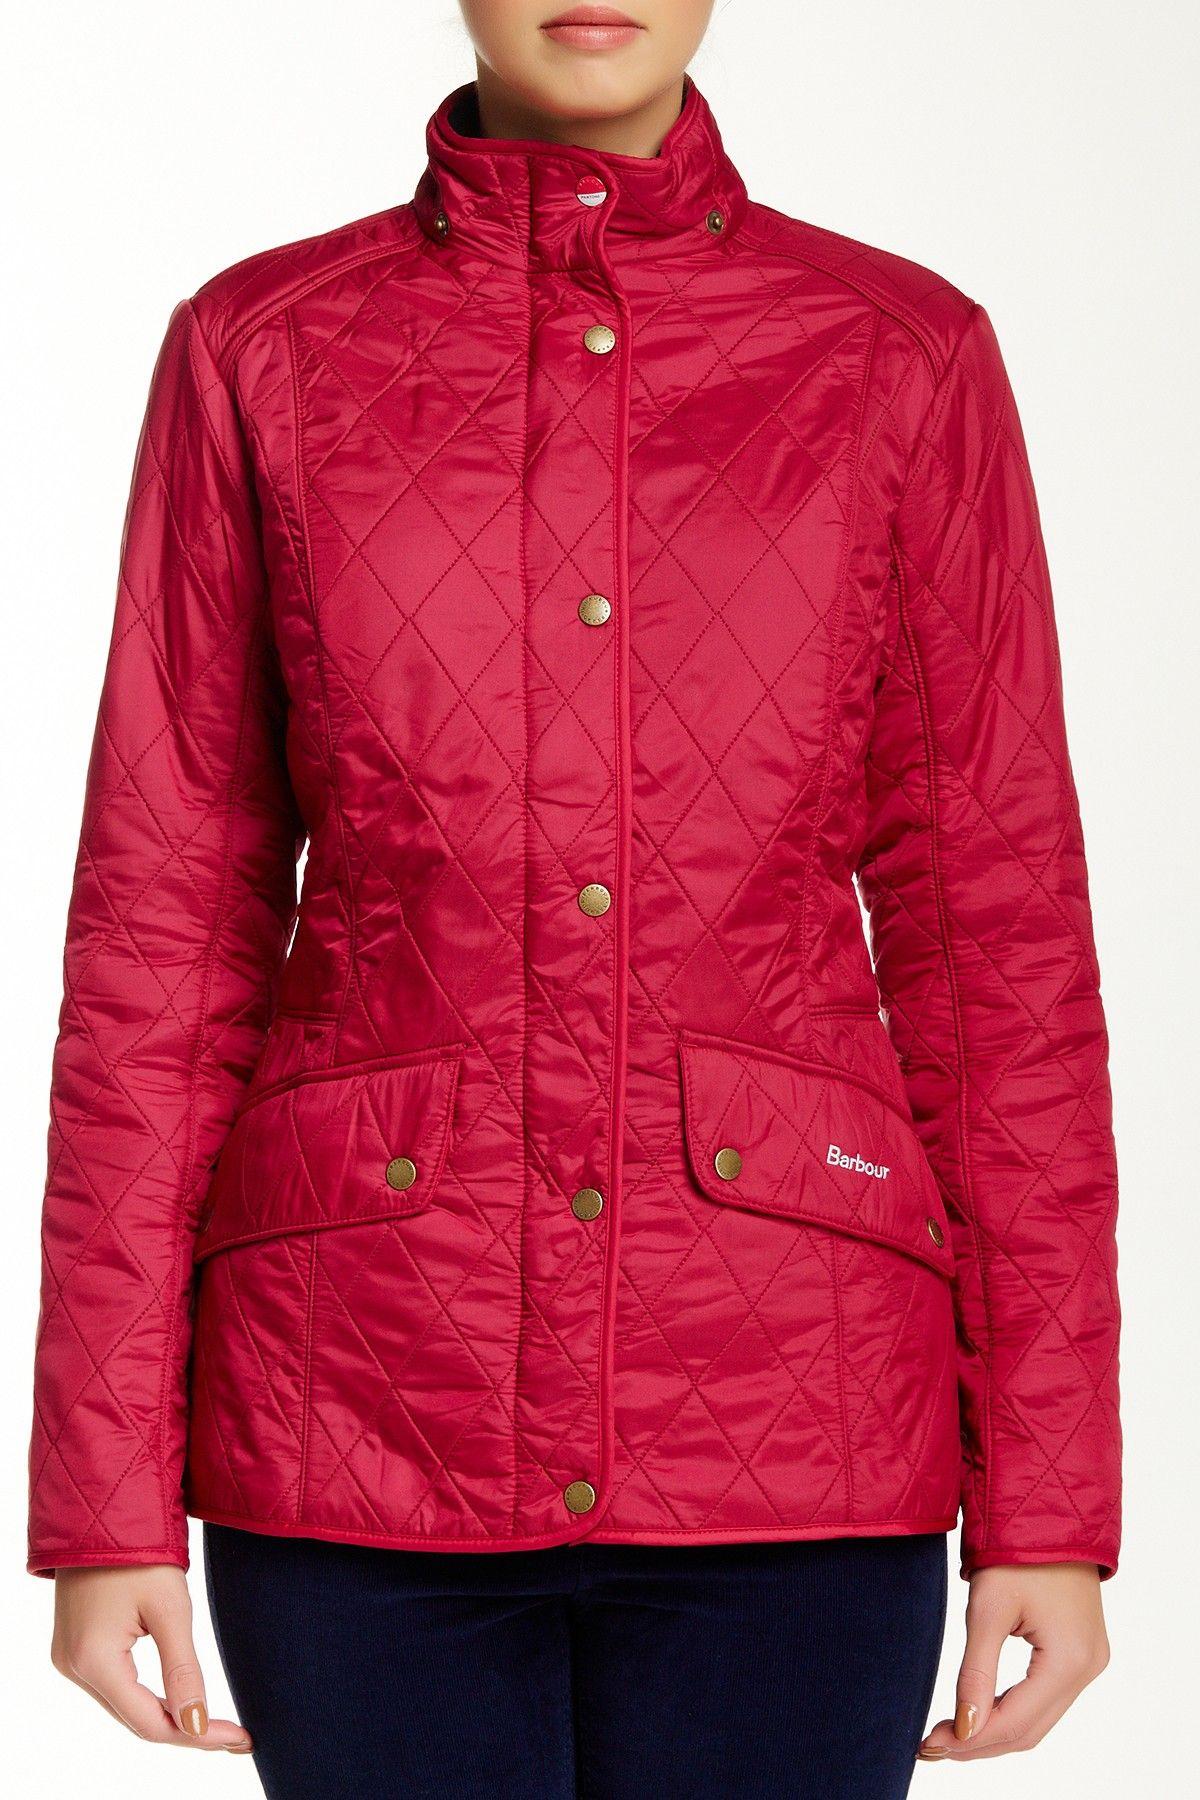 Barbour   Chromatic Quilts Jacket  